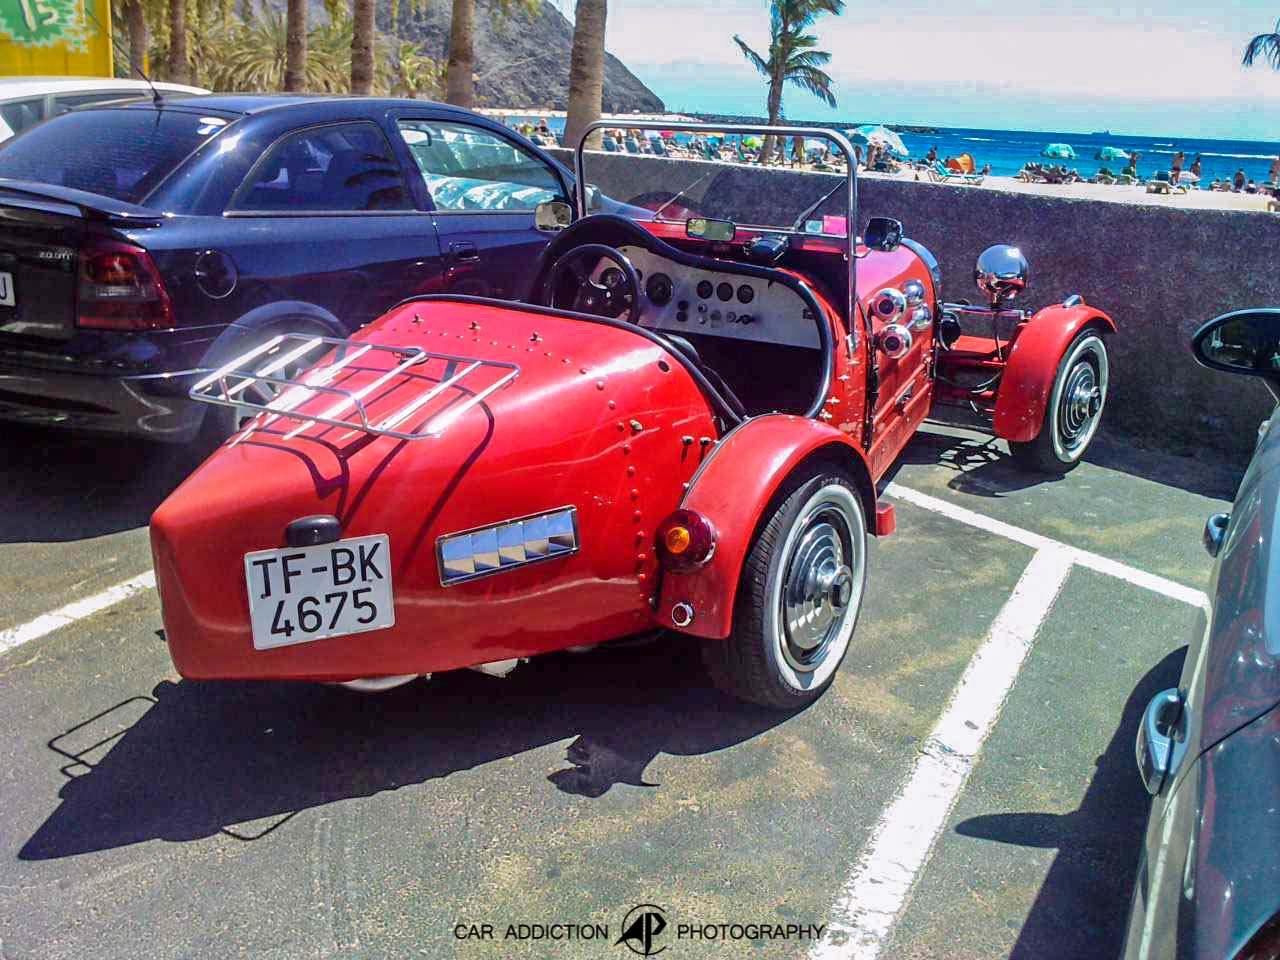 2000 (?). РЕПЛИКАР Bugatti Type 35B. Испания. Санта-Круз-де-Тенефире. Автор неизвестен